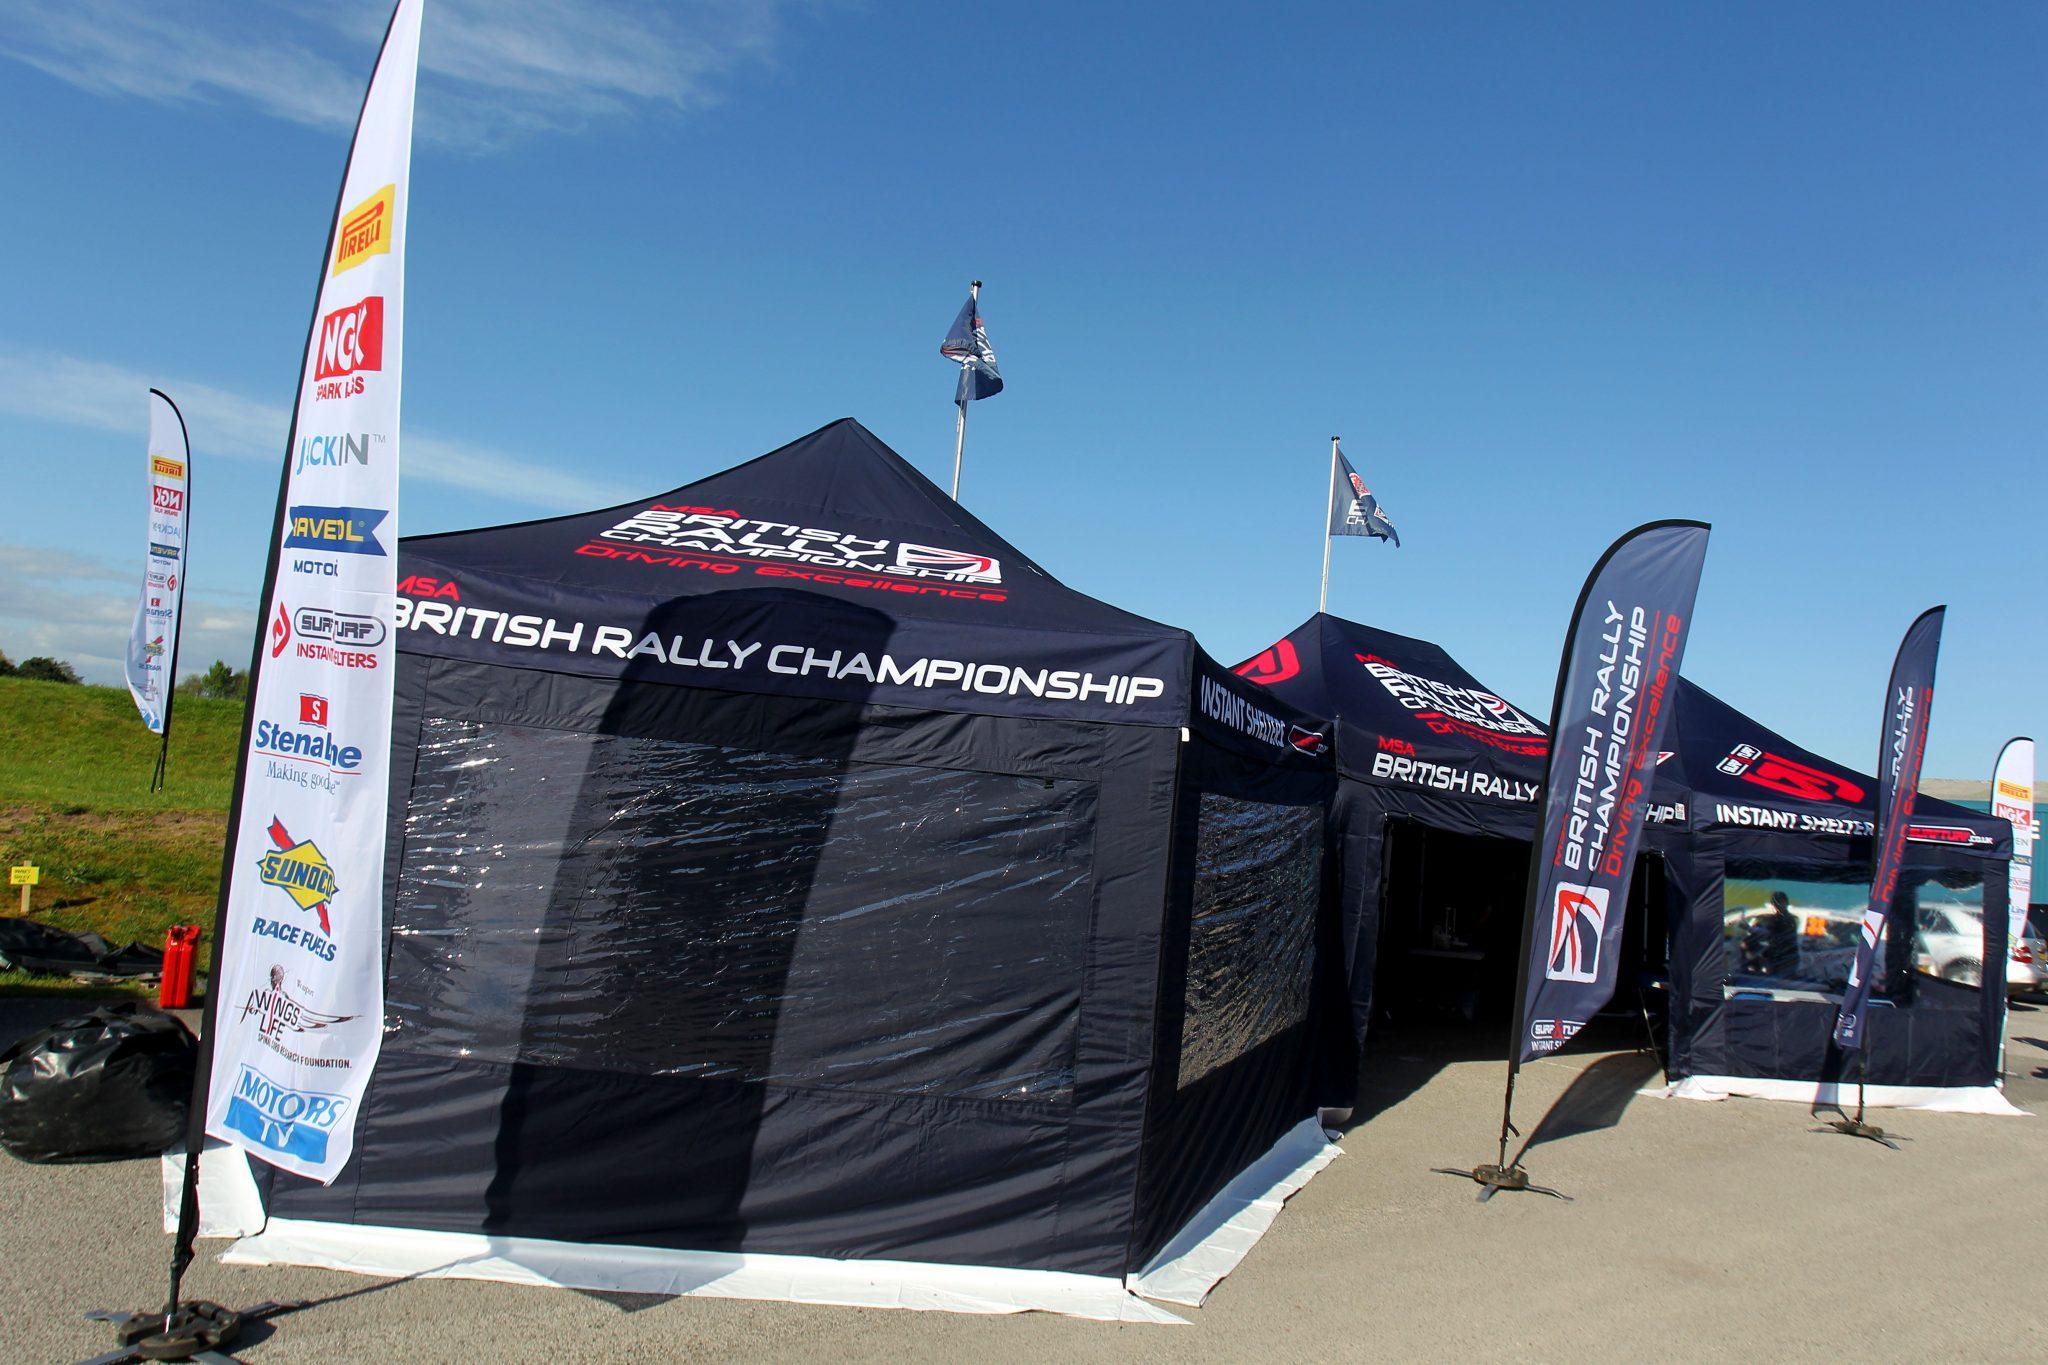 3002, 3002, British Rally Championship, BRC-12.jpg, 359067, https://surfturf.co.uk/wp-content/uploads/2018/06/BRC-12.jpg, https://surfturf.co.uk/case-studies/british-rally/attachment/british-rally-championship-11/, , 3, , British Rally Championship, british-rally-championship-11, inherit, 849, 2018-11-28 14:22:45, 2018-11-28 14:22:45, 0, image/jpeg, image, jpeg, https://surfturf.co.uk/wp-includes/images/media/default.png, 2048, 1365, Array